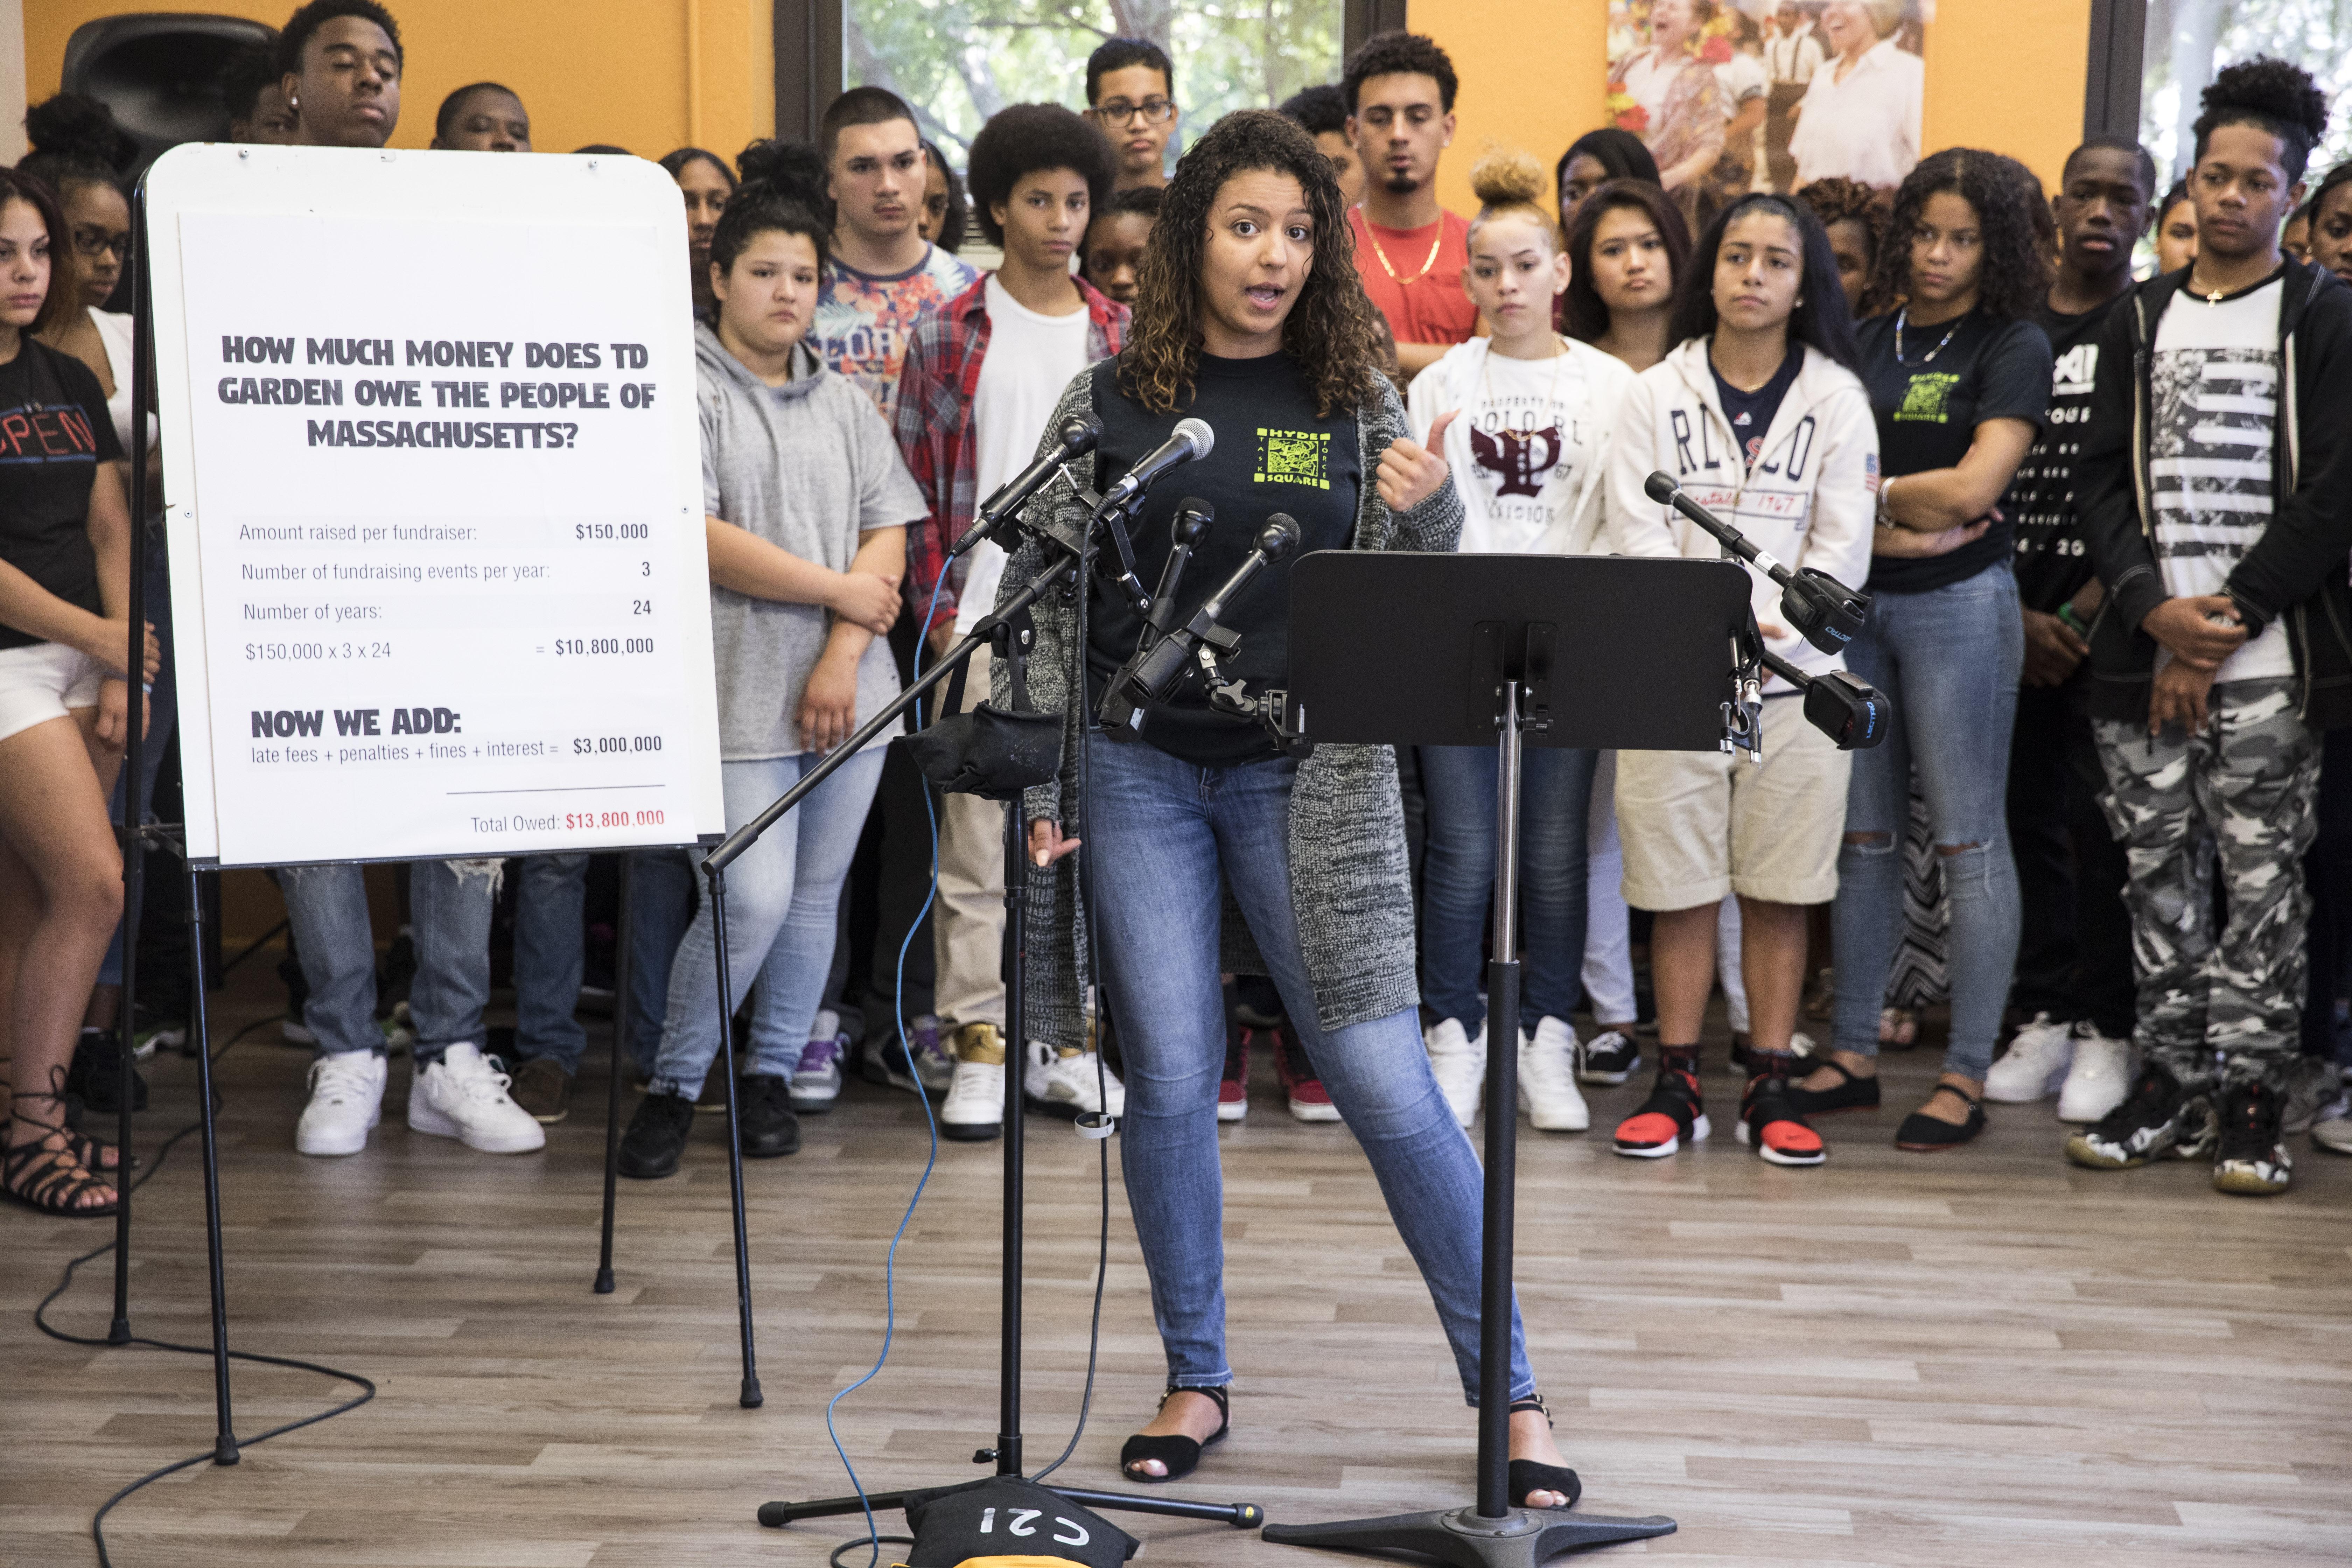 Teen sleuths say TD Garden owes $13 8 million in fund